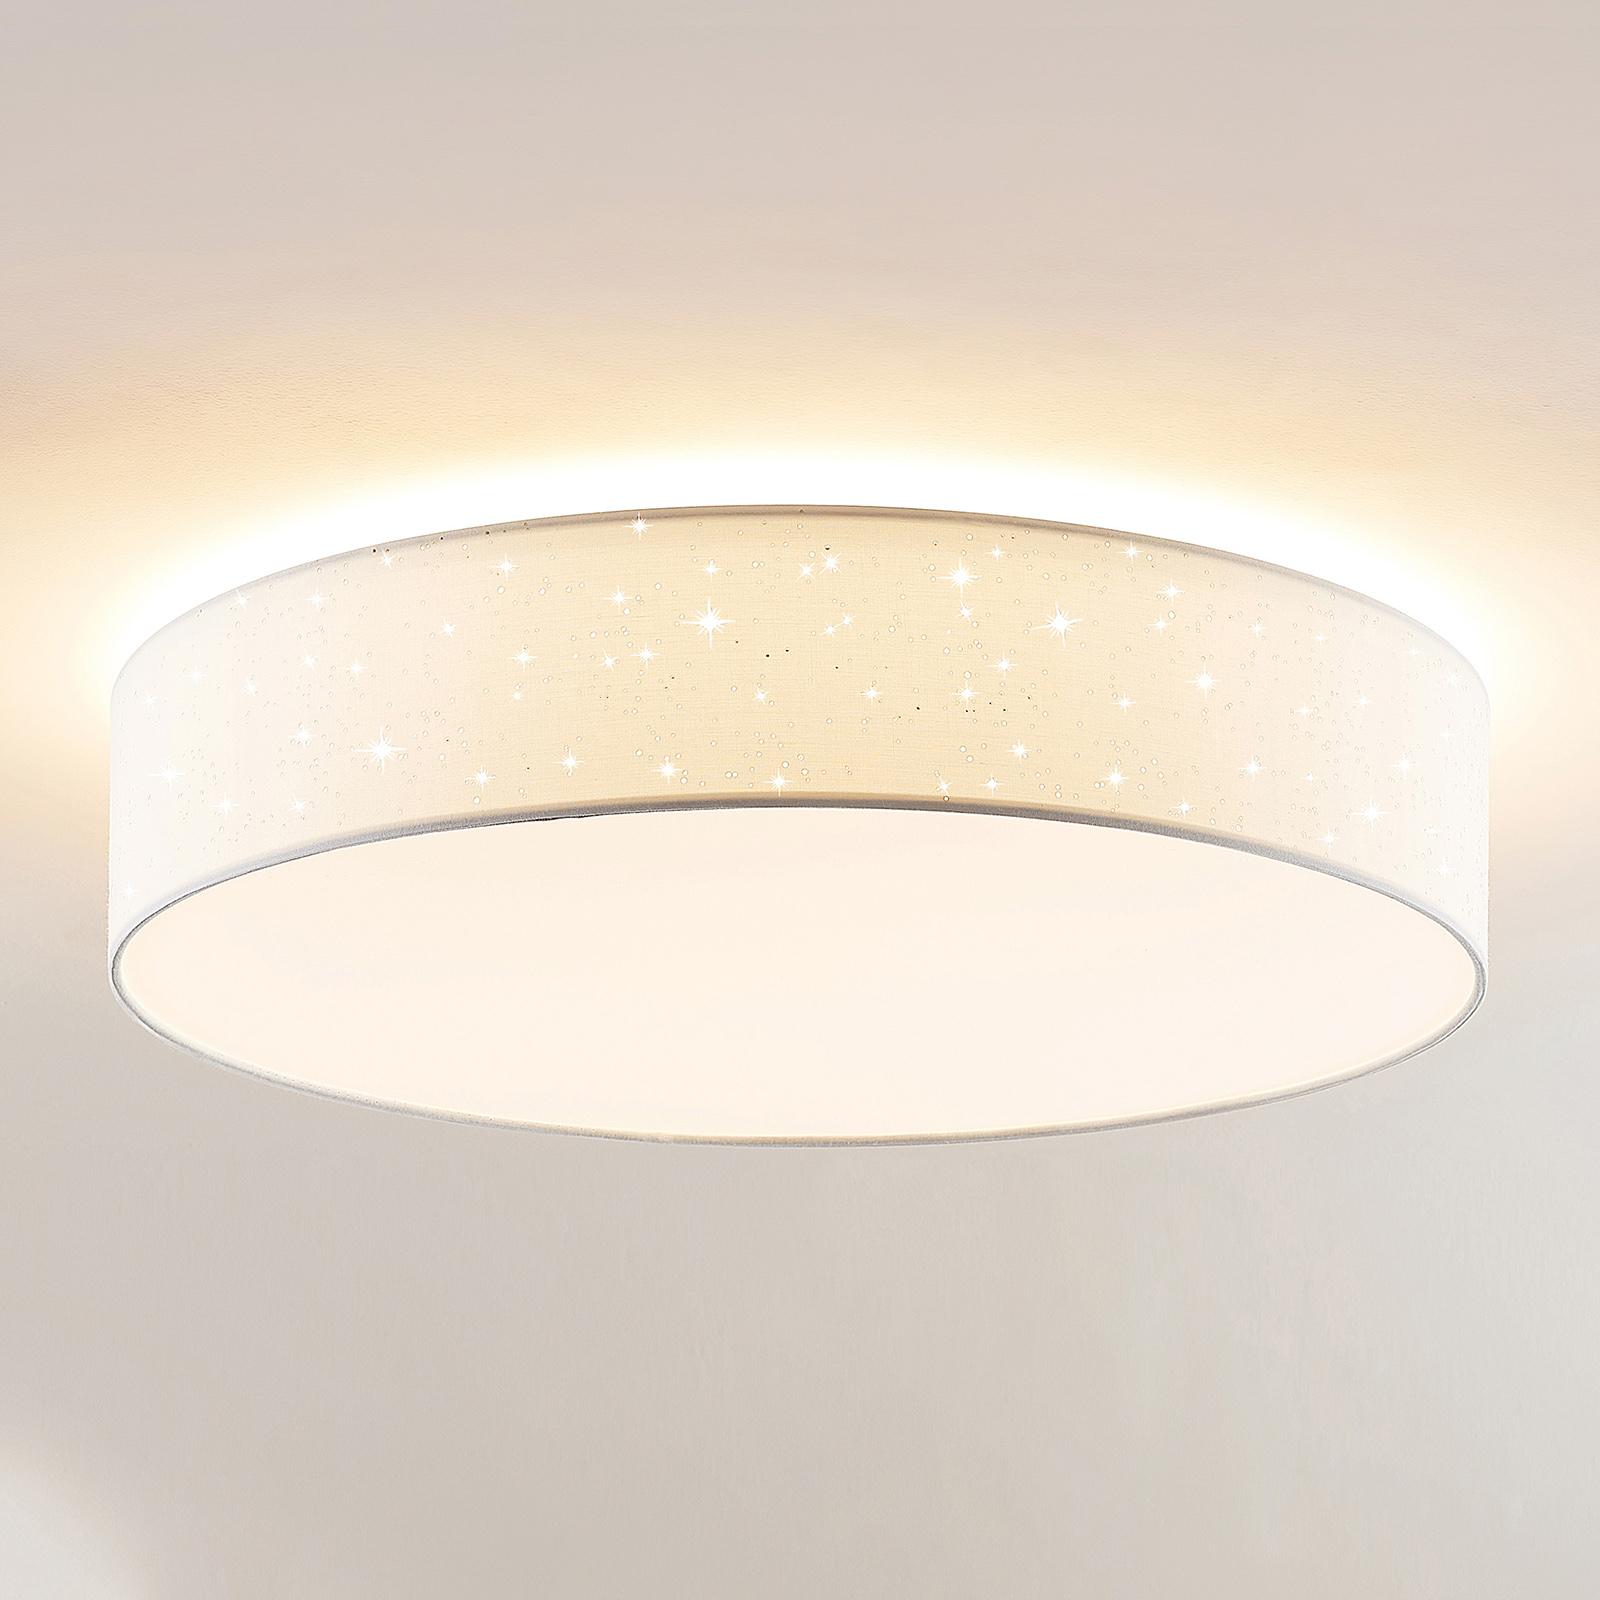 Lindby Ellamina LED-taklampe, 60 cm, hvit